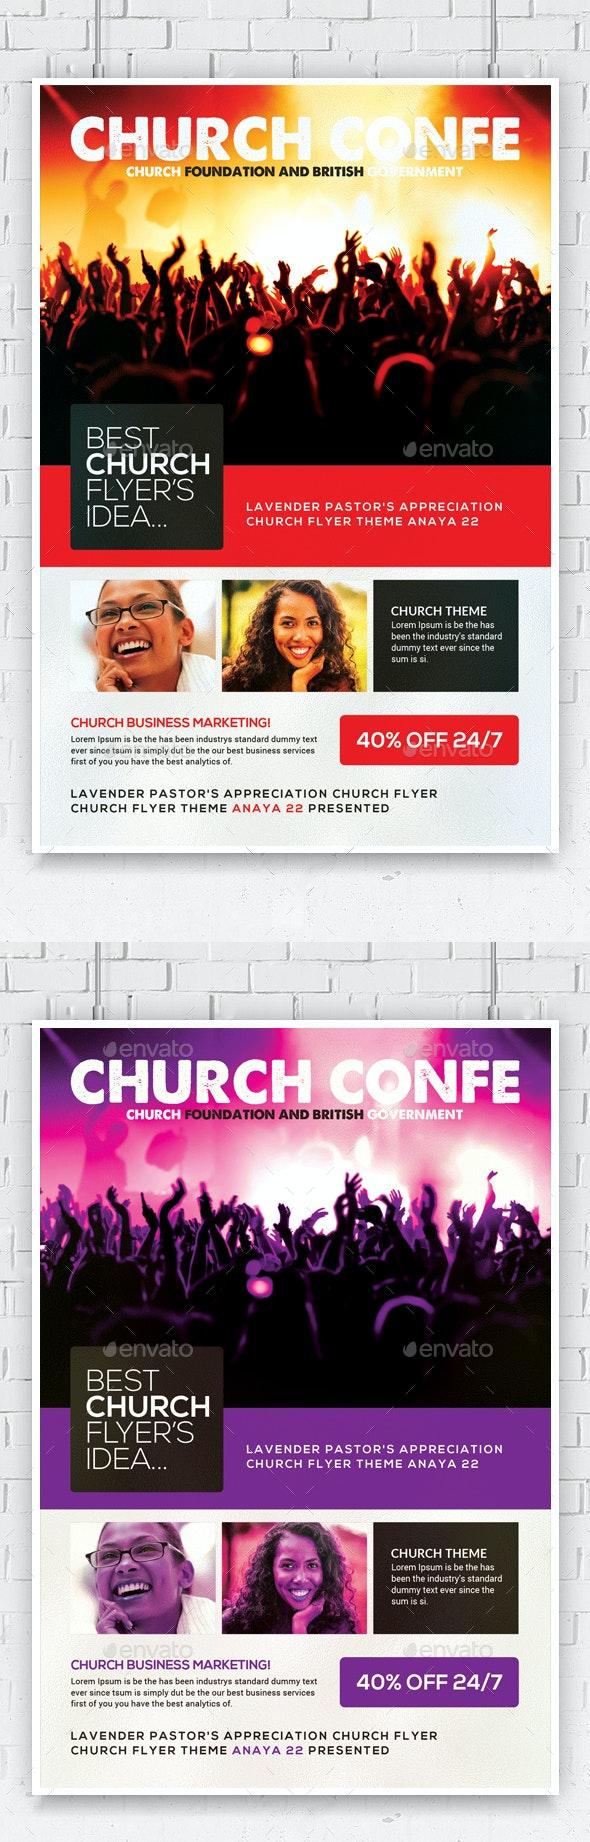 Gospel Glory Church Flyer  - Church Flyers